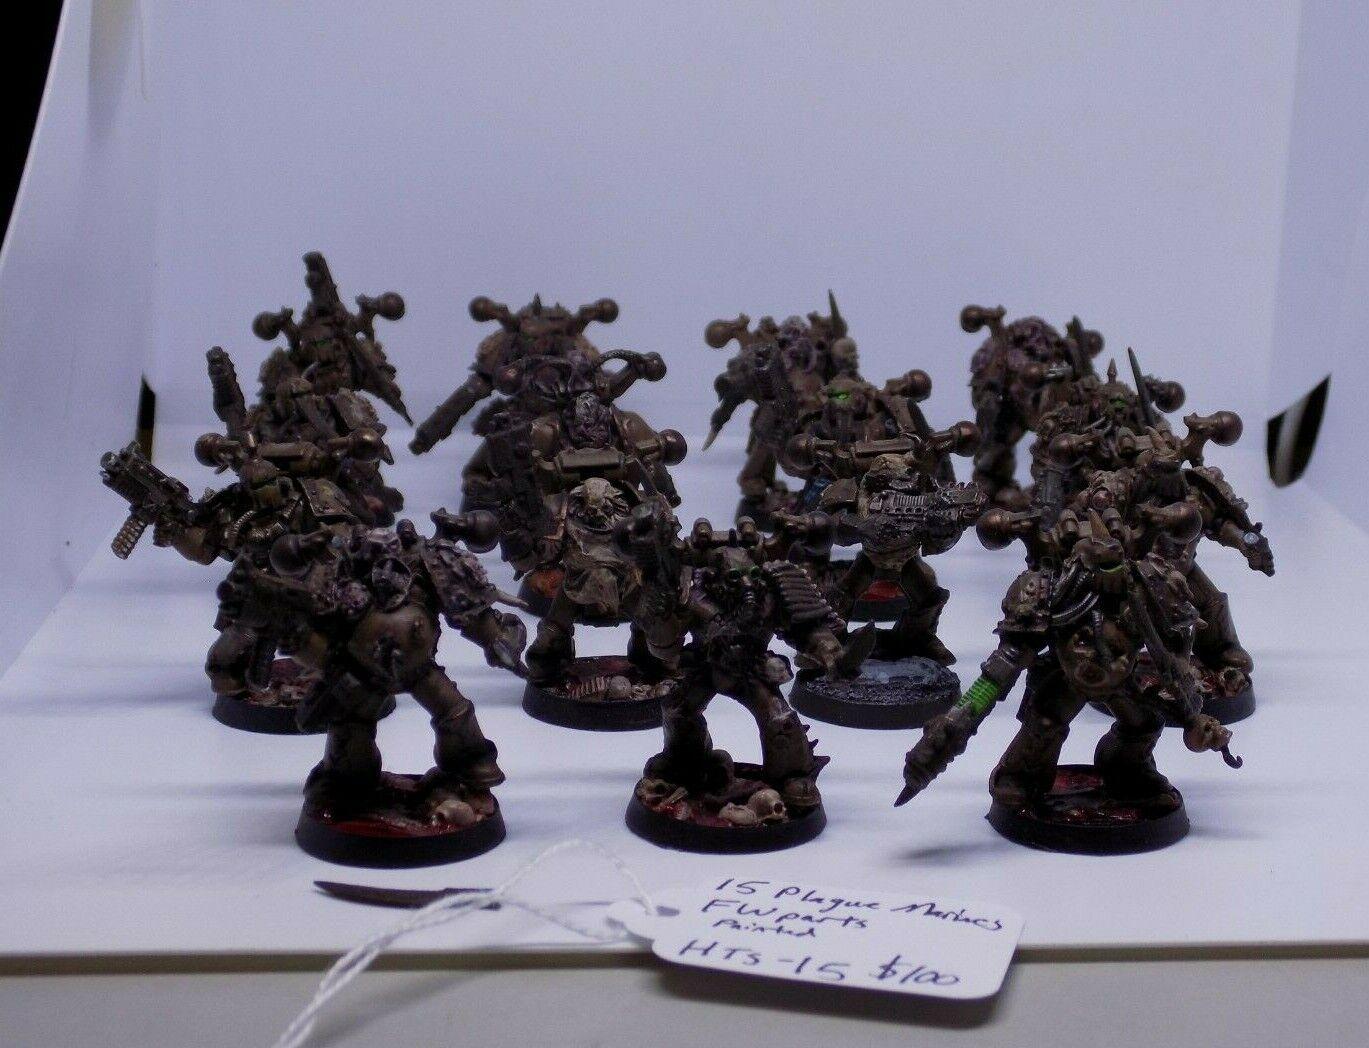 Warhammer 40k Chaos Space Marines 15 Death Guard Plague Marines (HTS 15)